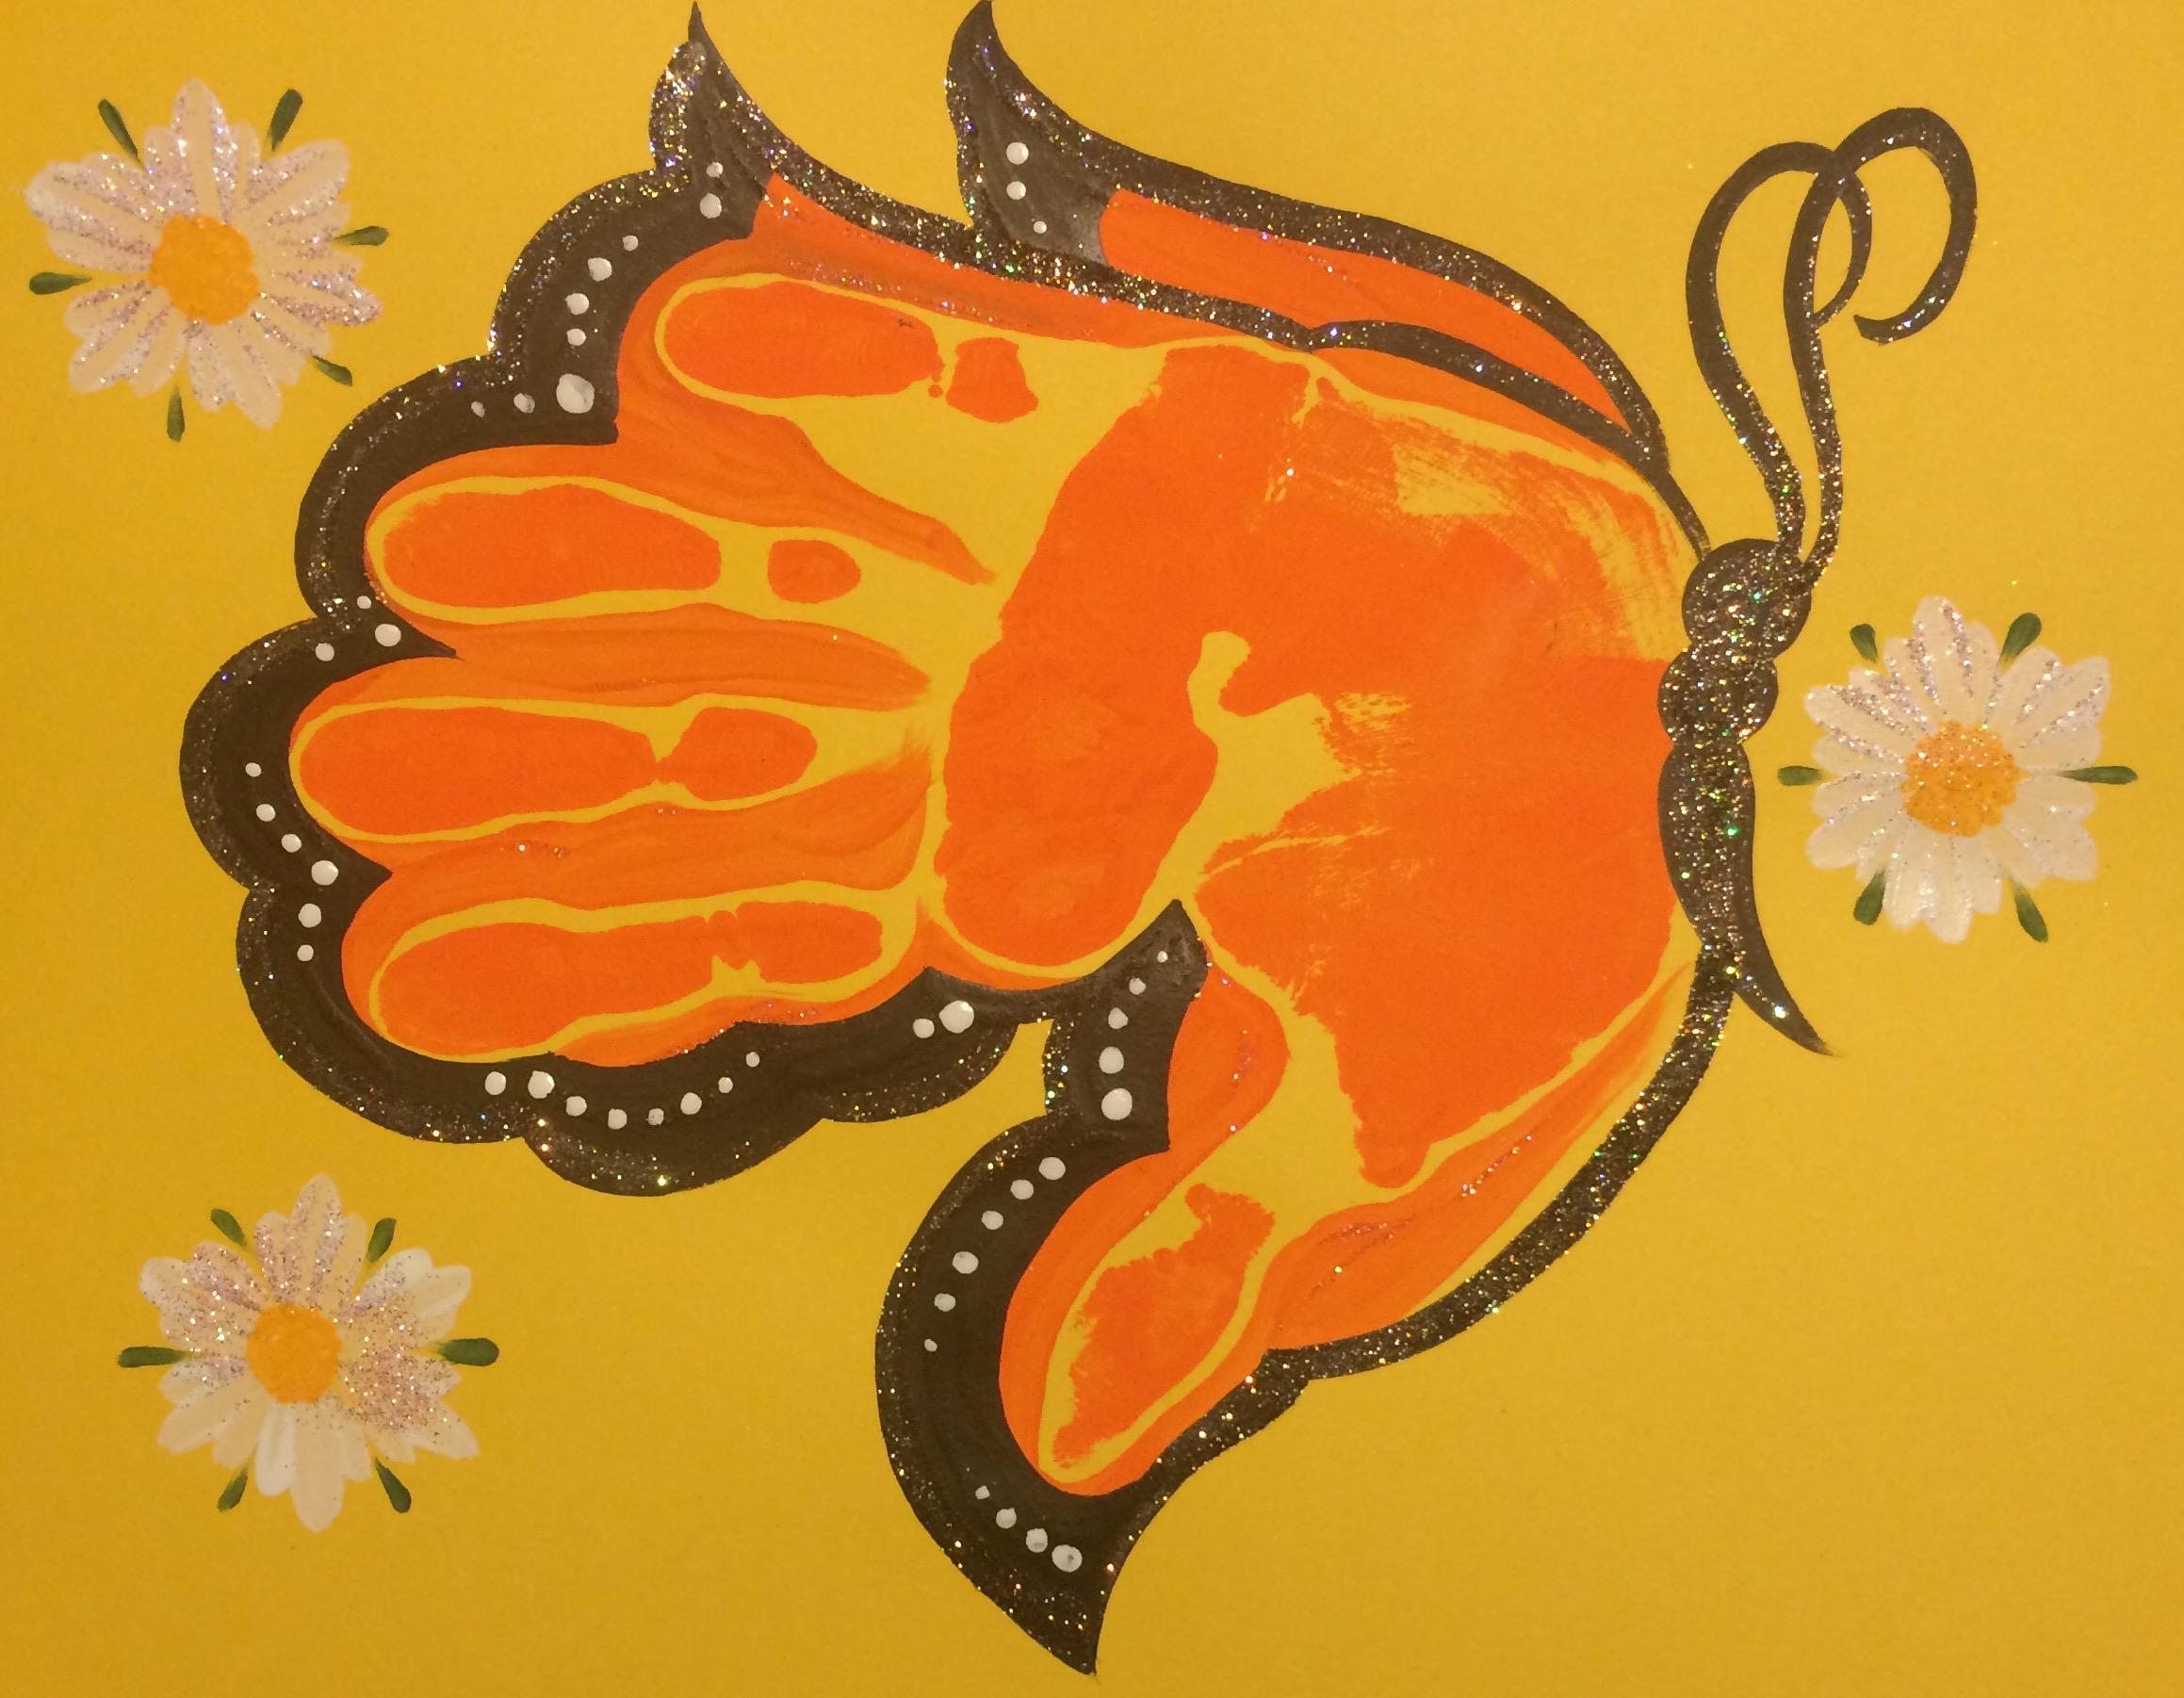 Handprint clipart hand impression (Butterfly) on Print Sakes art